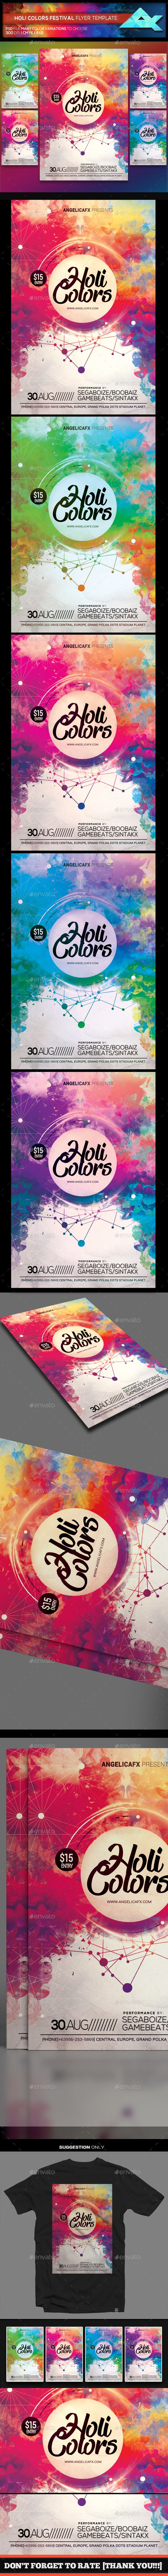 holi colors music festival flyer template flyer templates